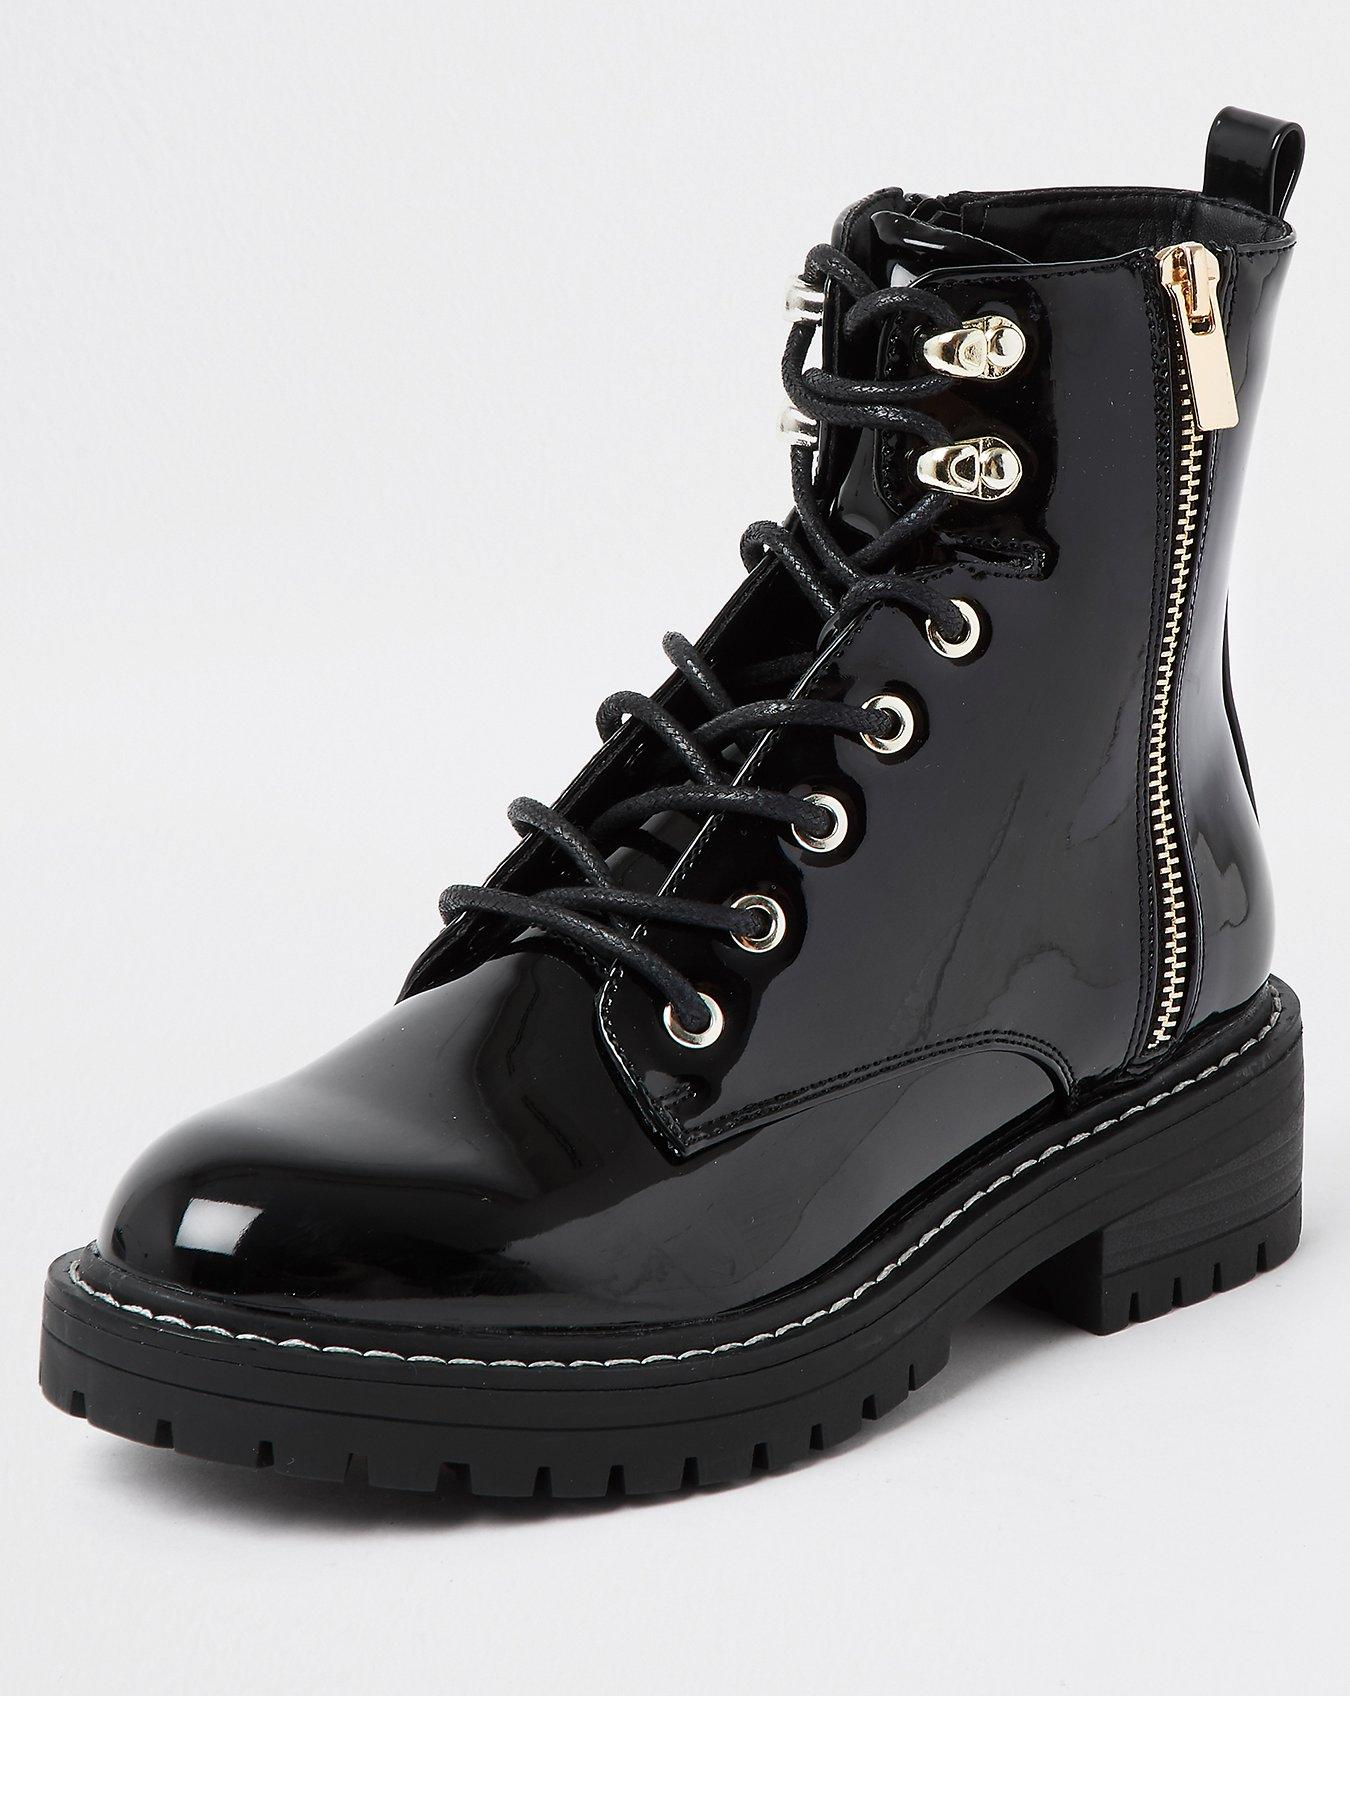 River Island Shoes \u0026 Boots | Women